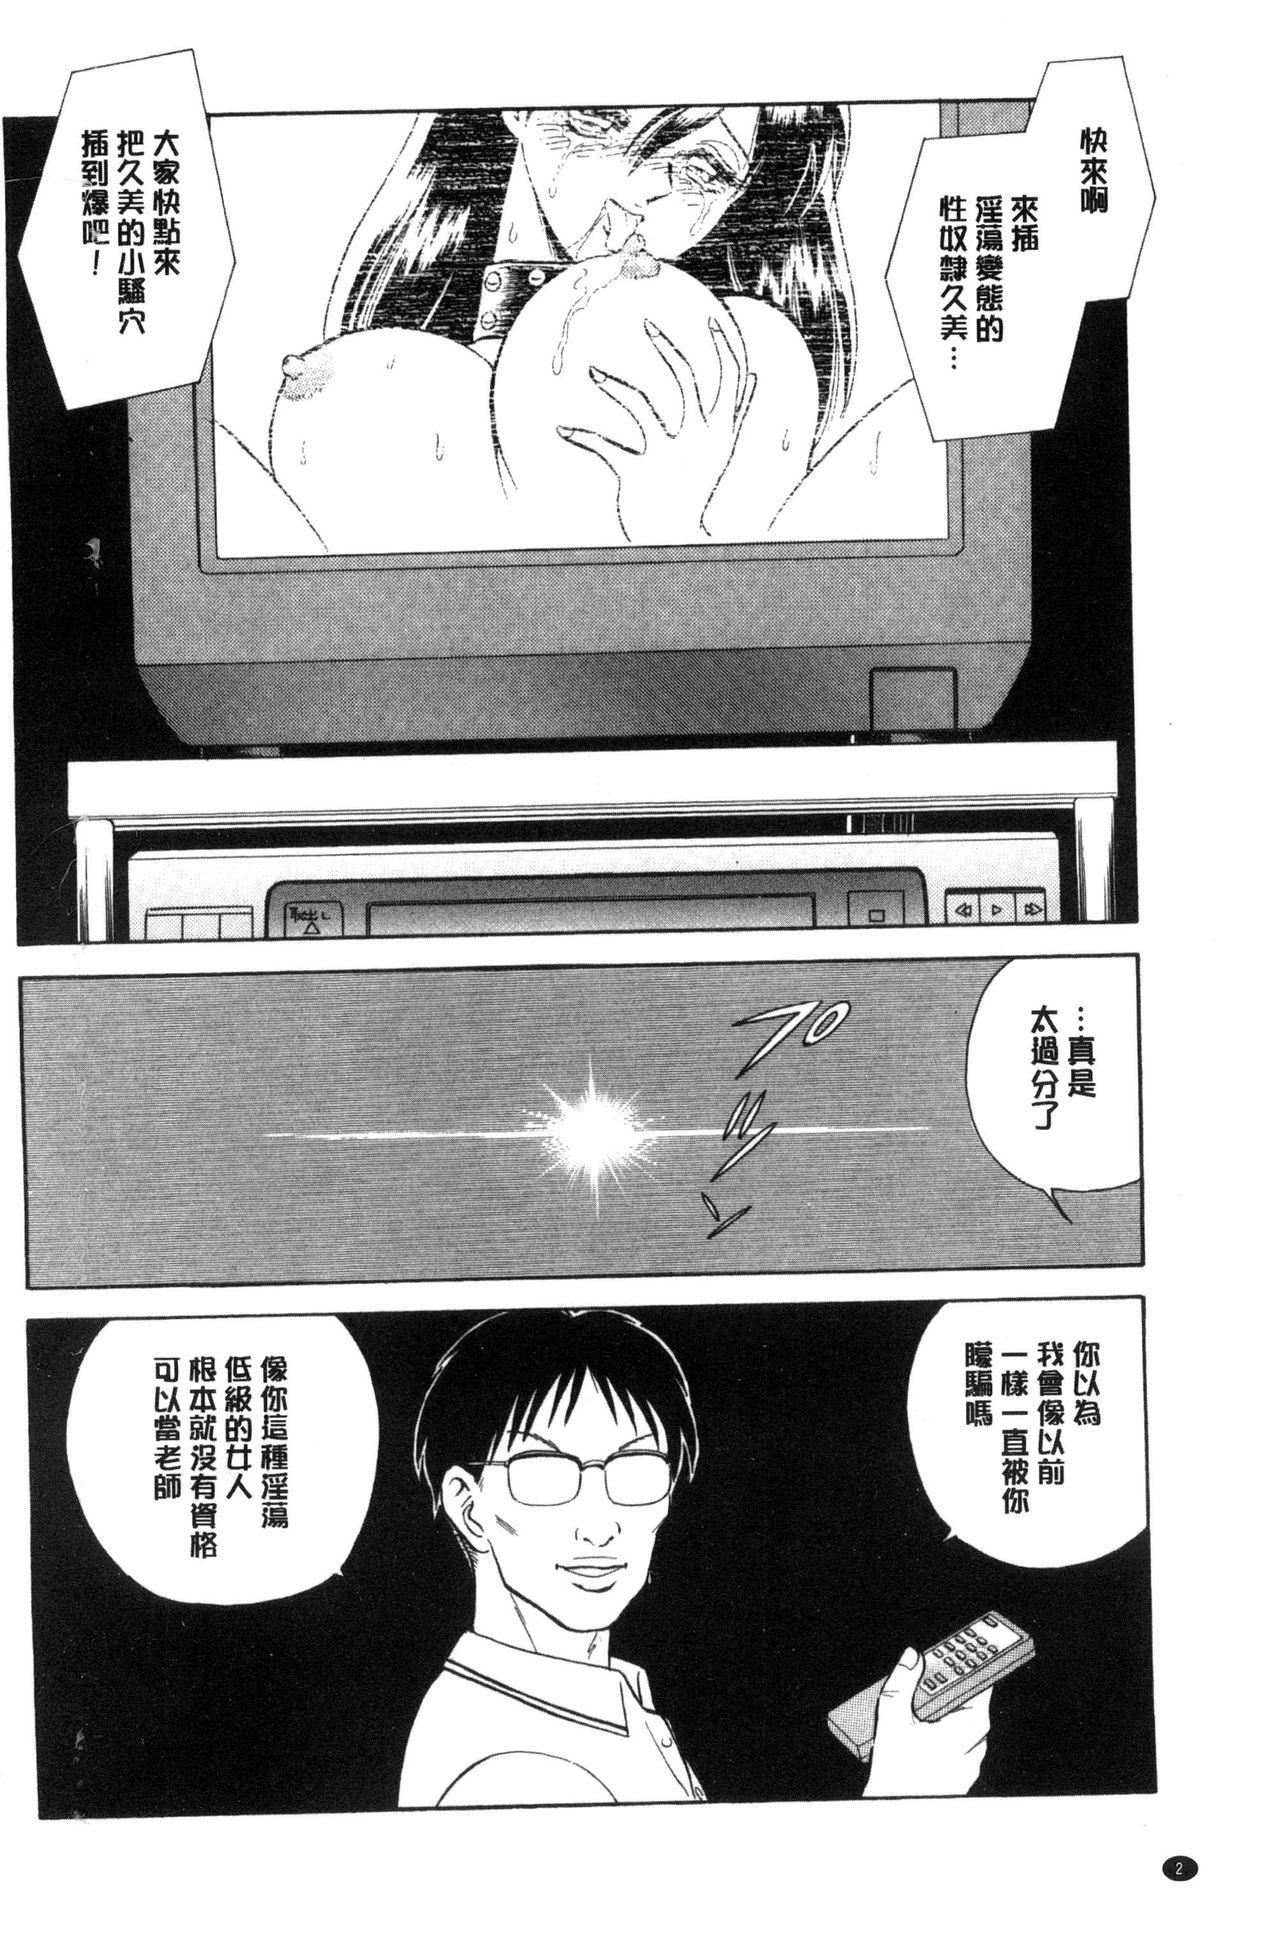 Hazukashii Kagai Jugyou | 害羞的課外授業 2